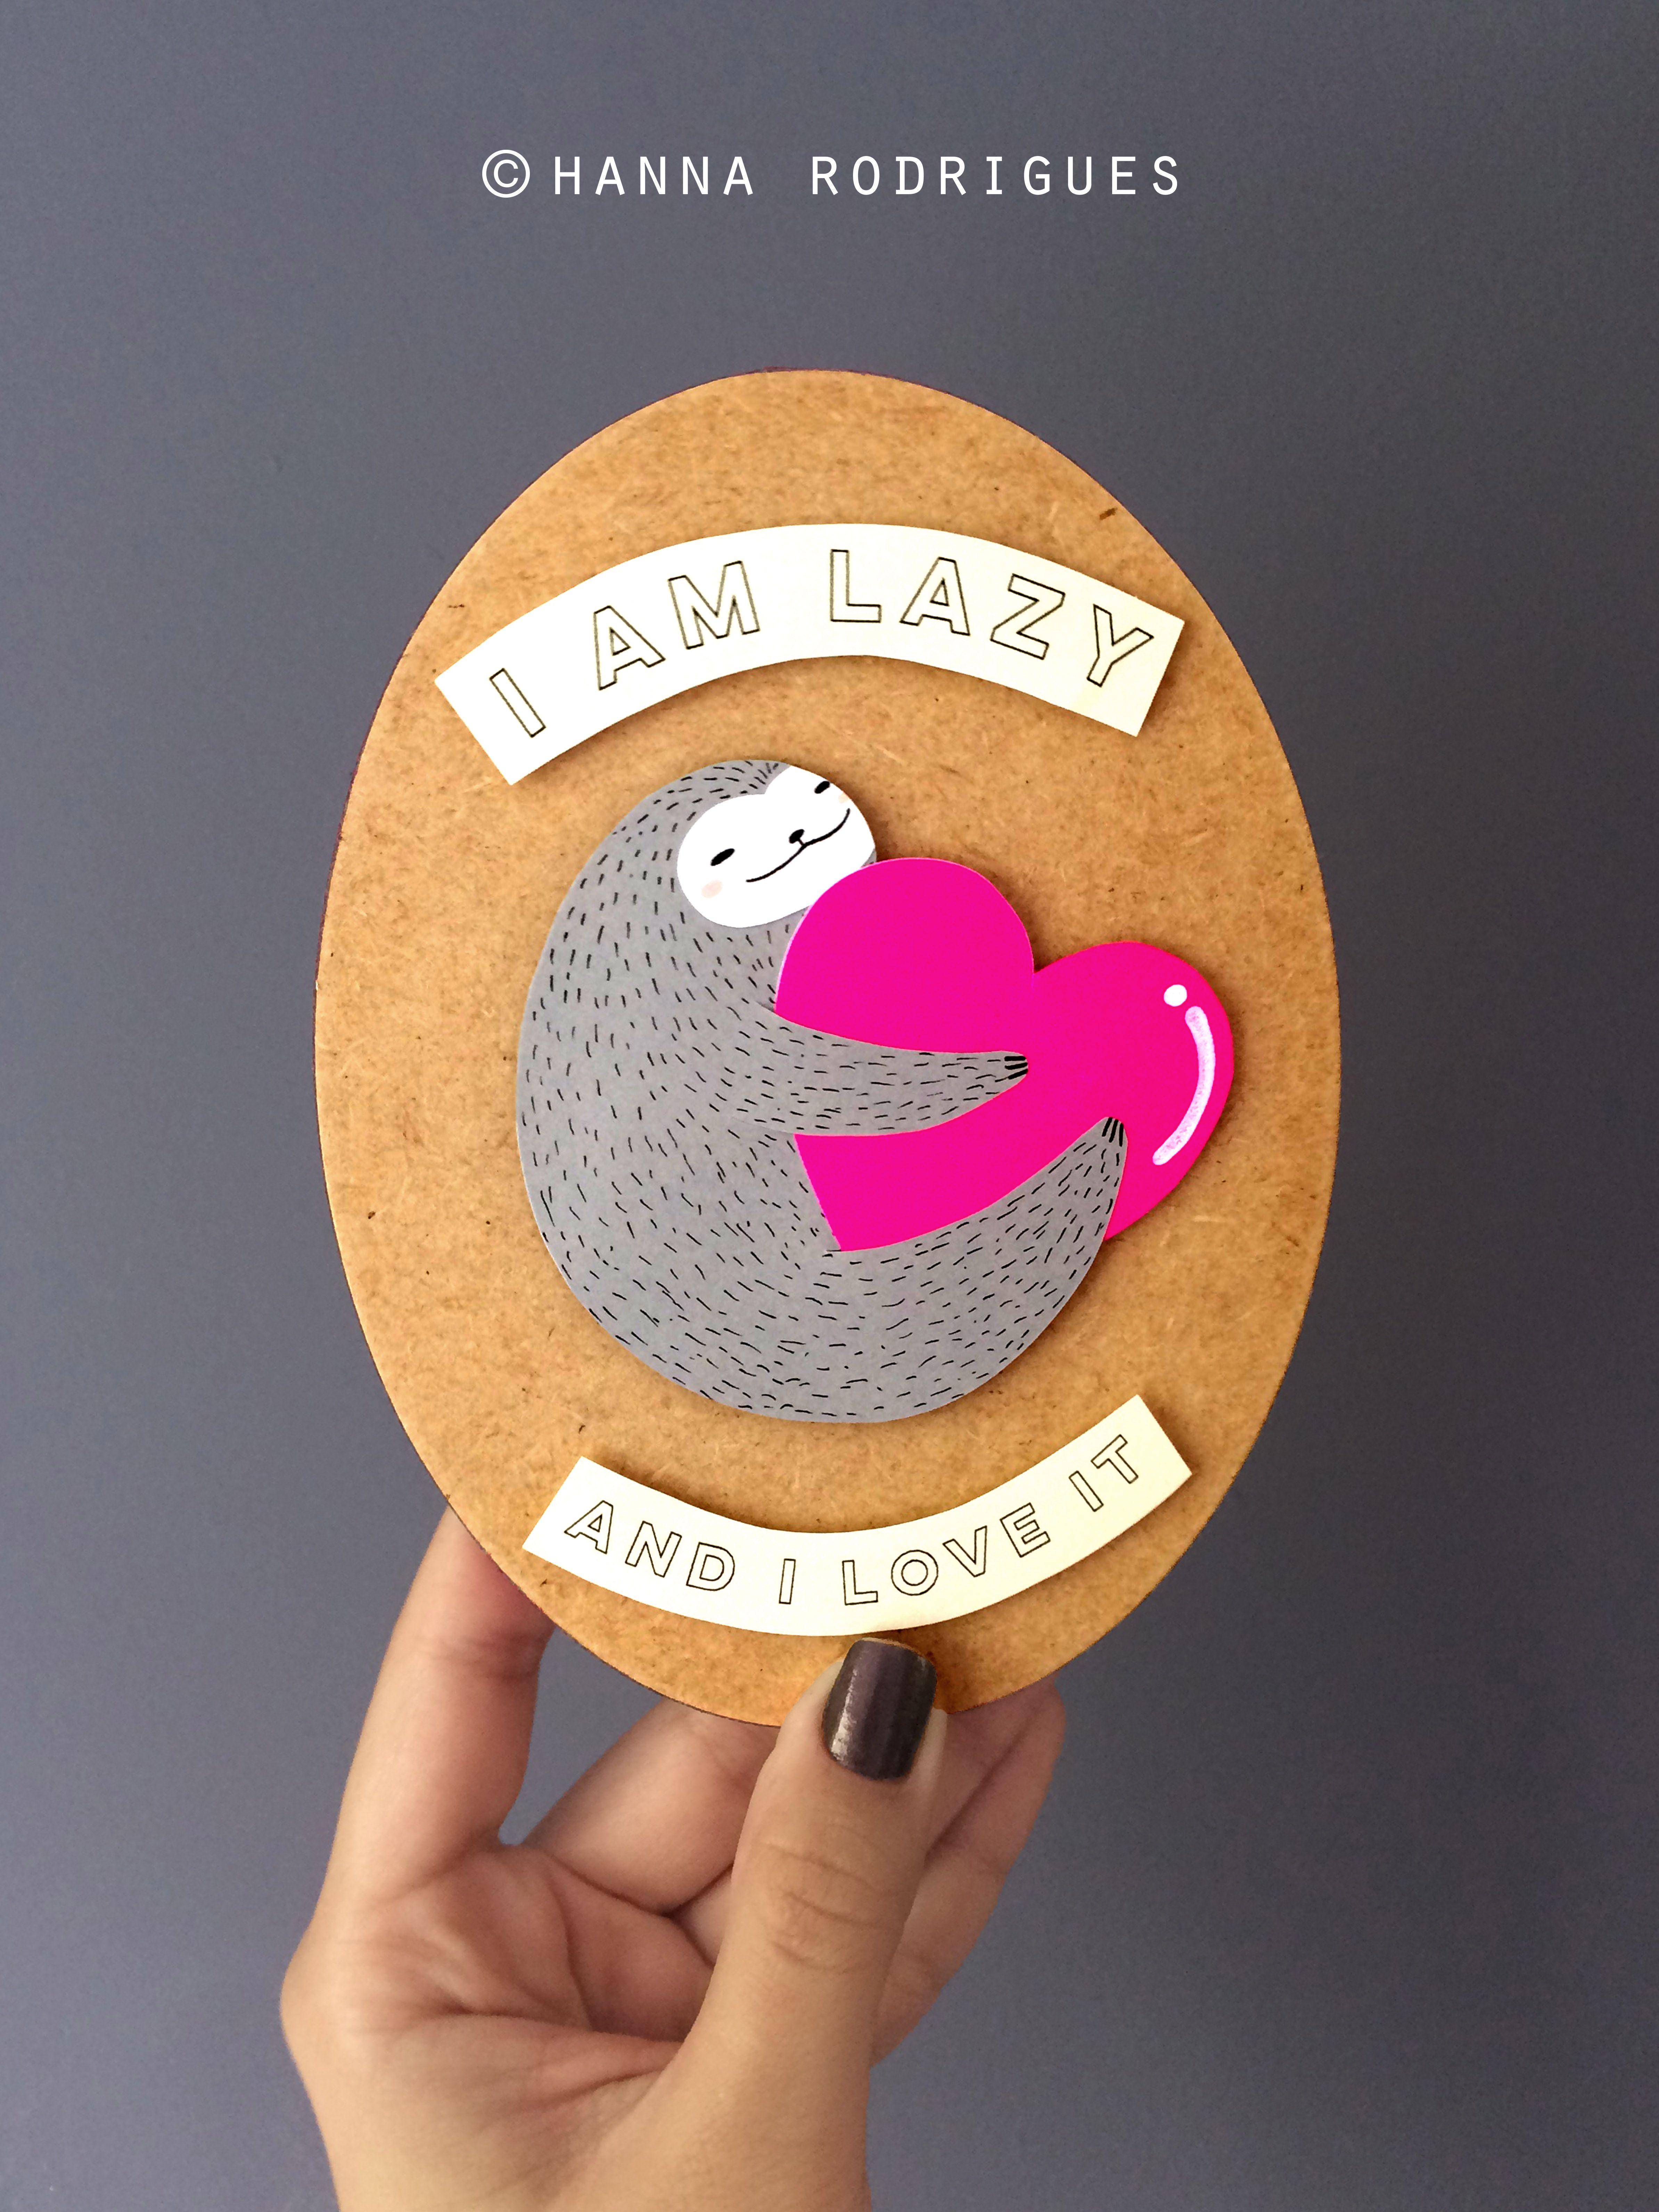 #illustration #handmade #crafts #sloth #art  #ilustração #paper #papercut #paperart #feitoamao #preguiça #lazy